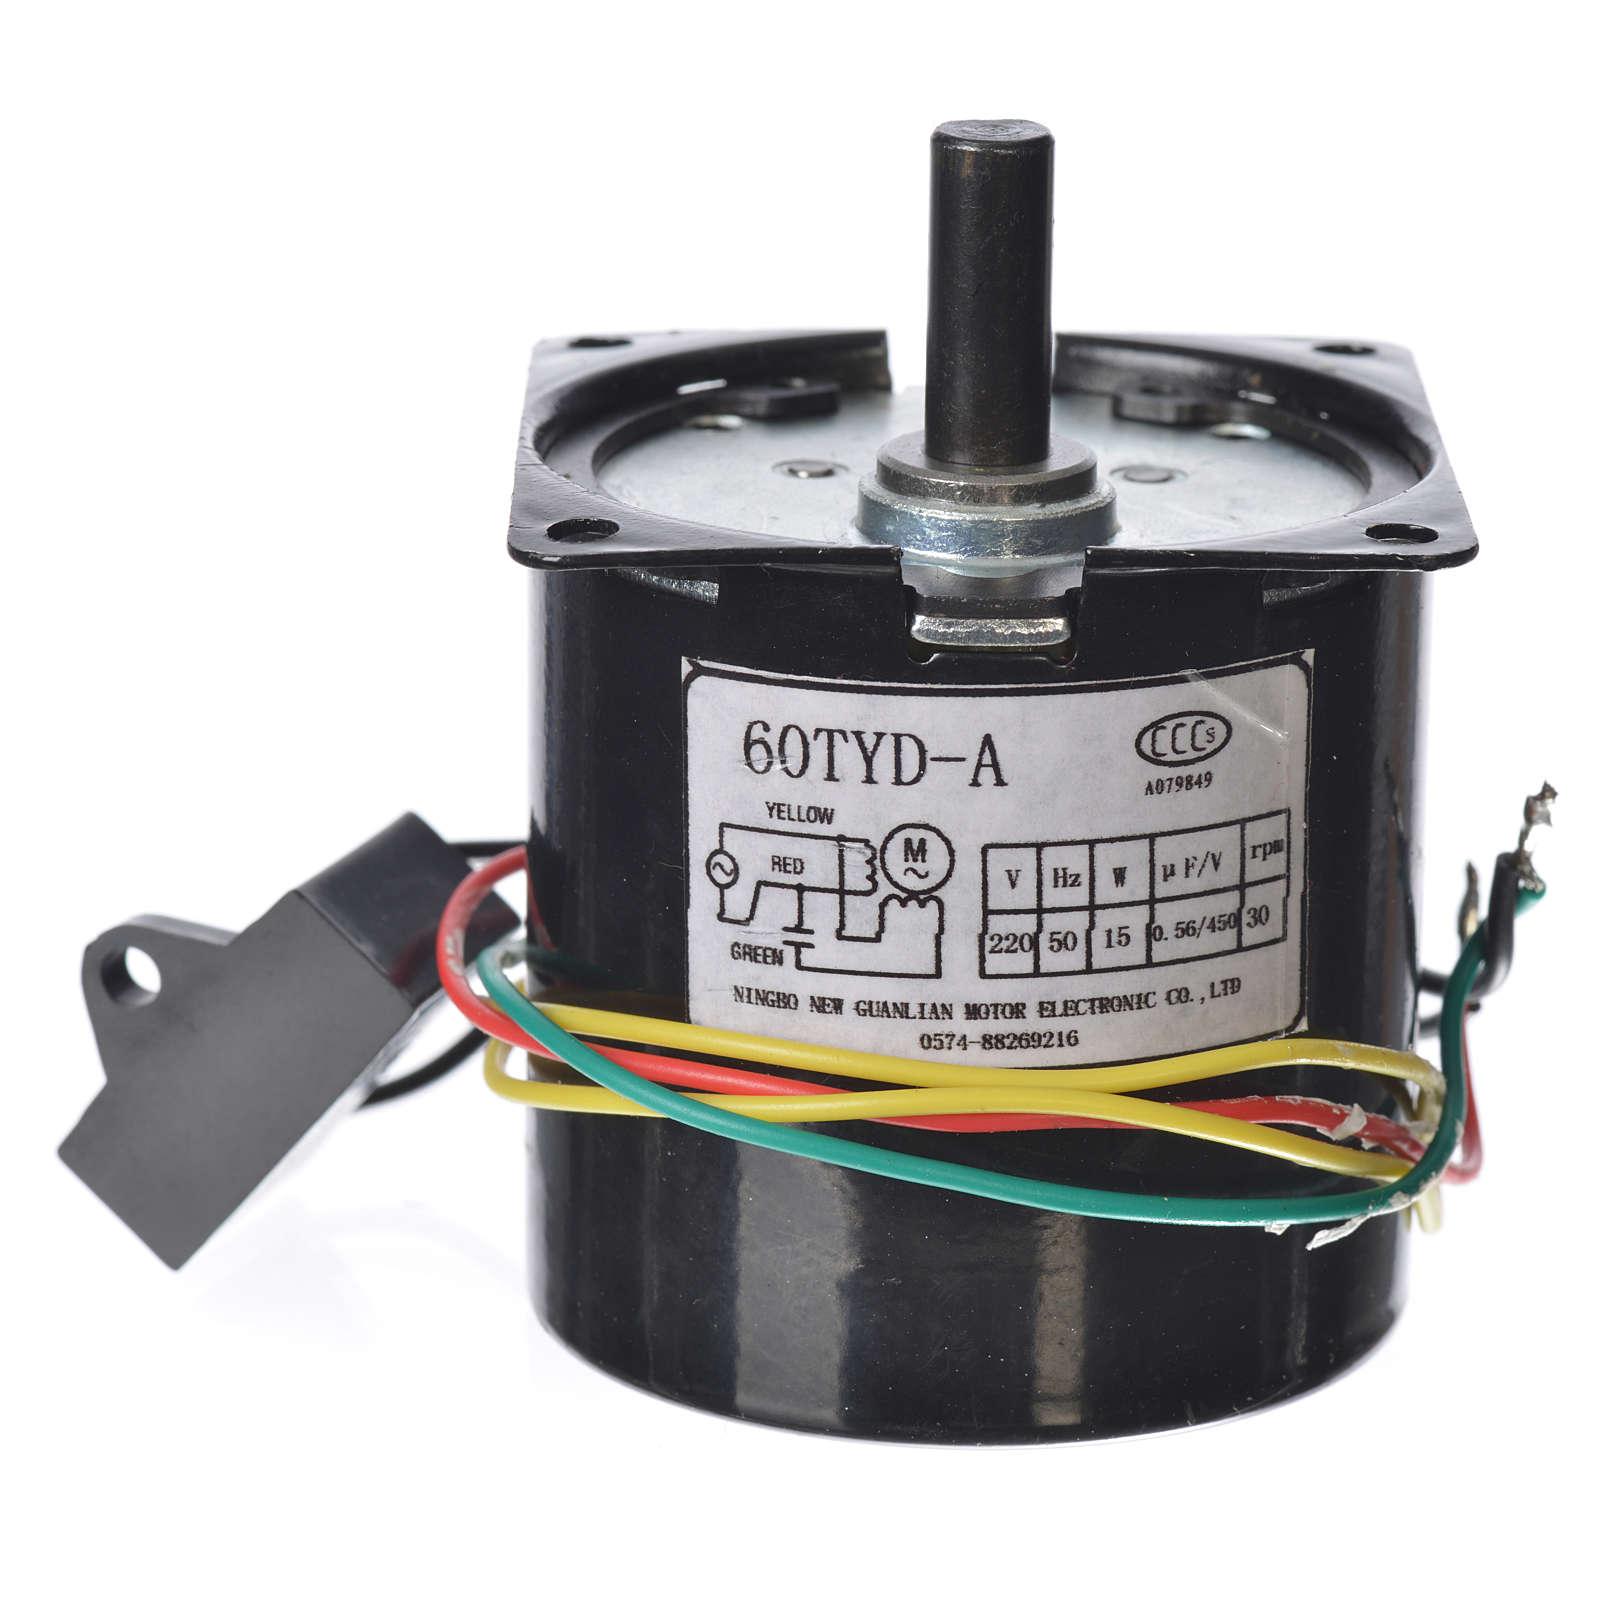 Motoriduttore MPW 30 giri/min presepe 4